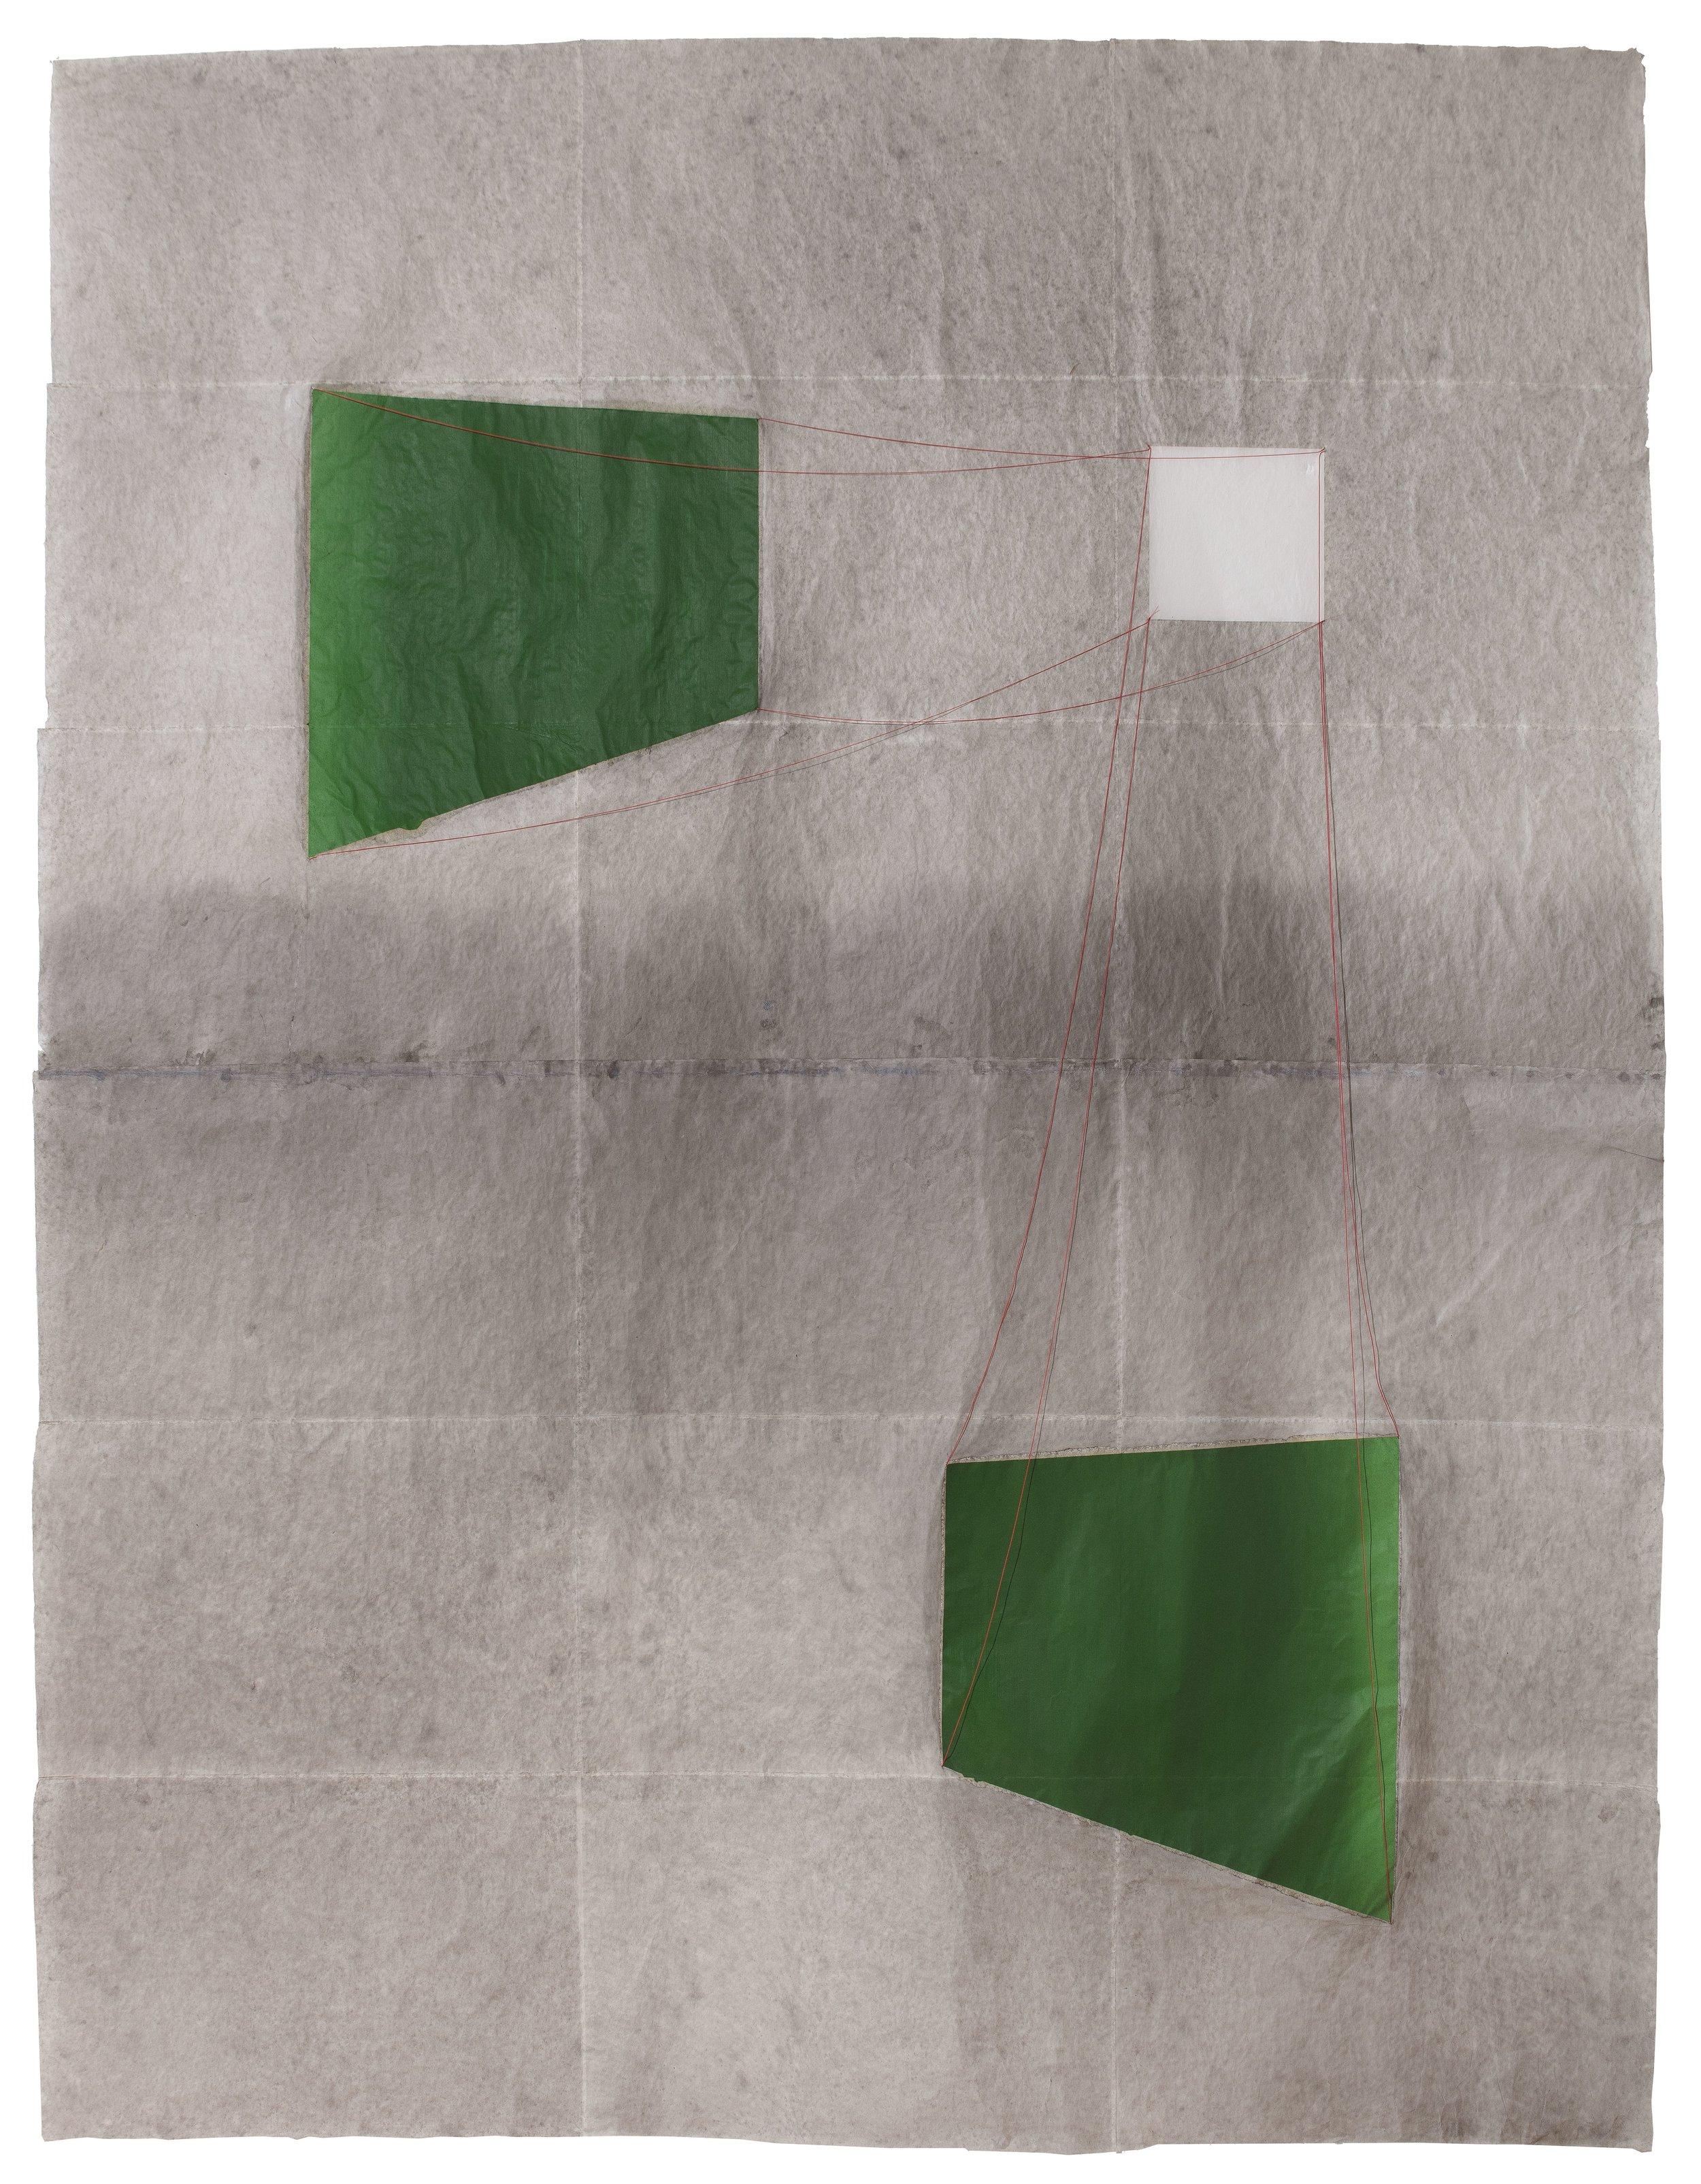 Gran Green Room, by Lluis Lleo